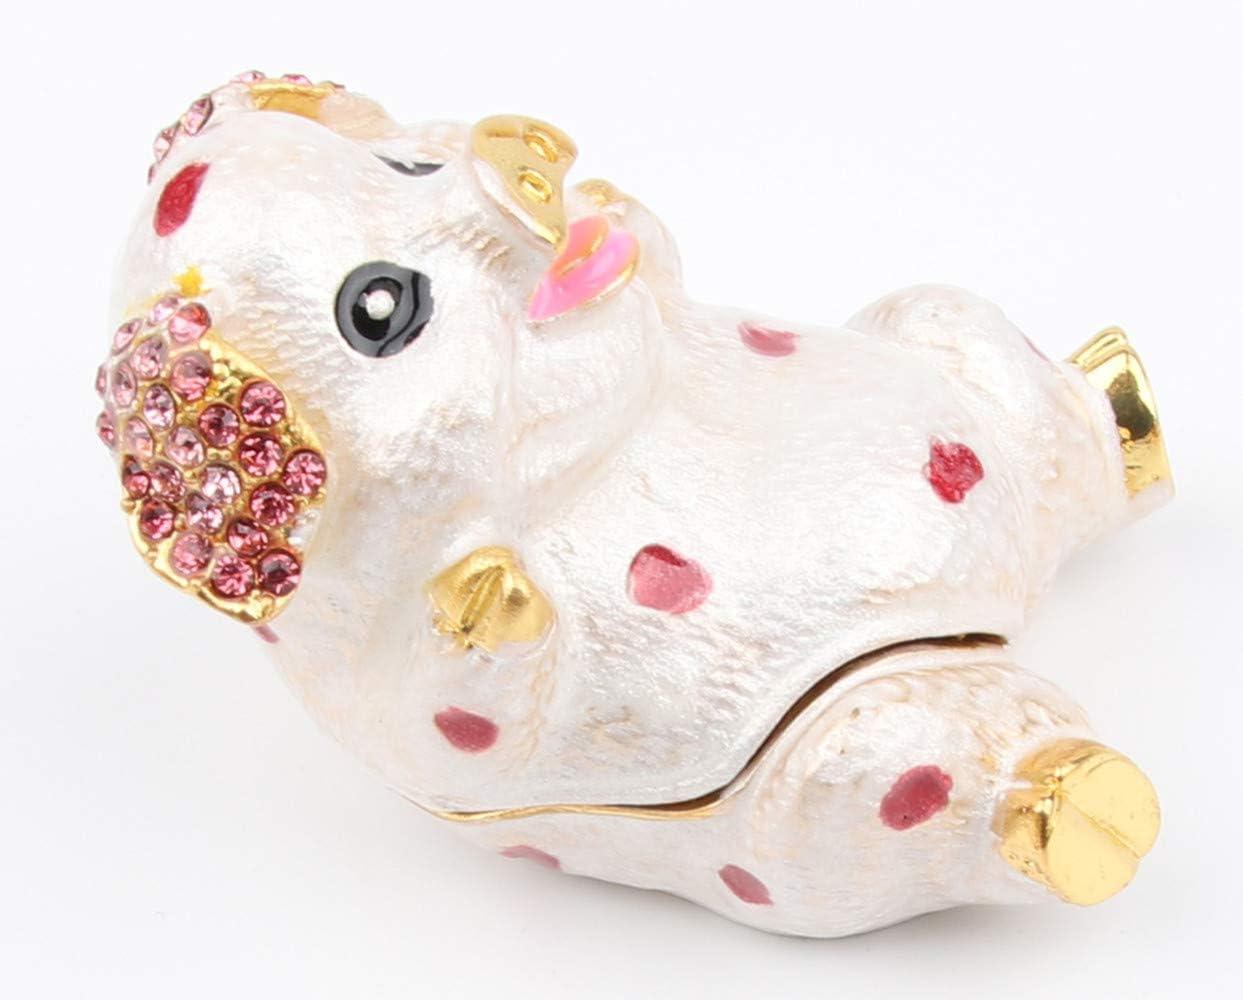 Pig Figurines Hinged Jewelry Trinket Box